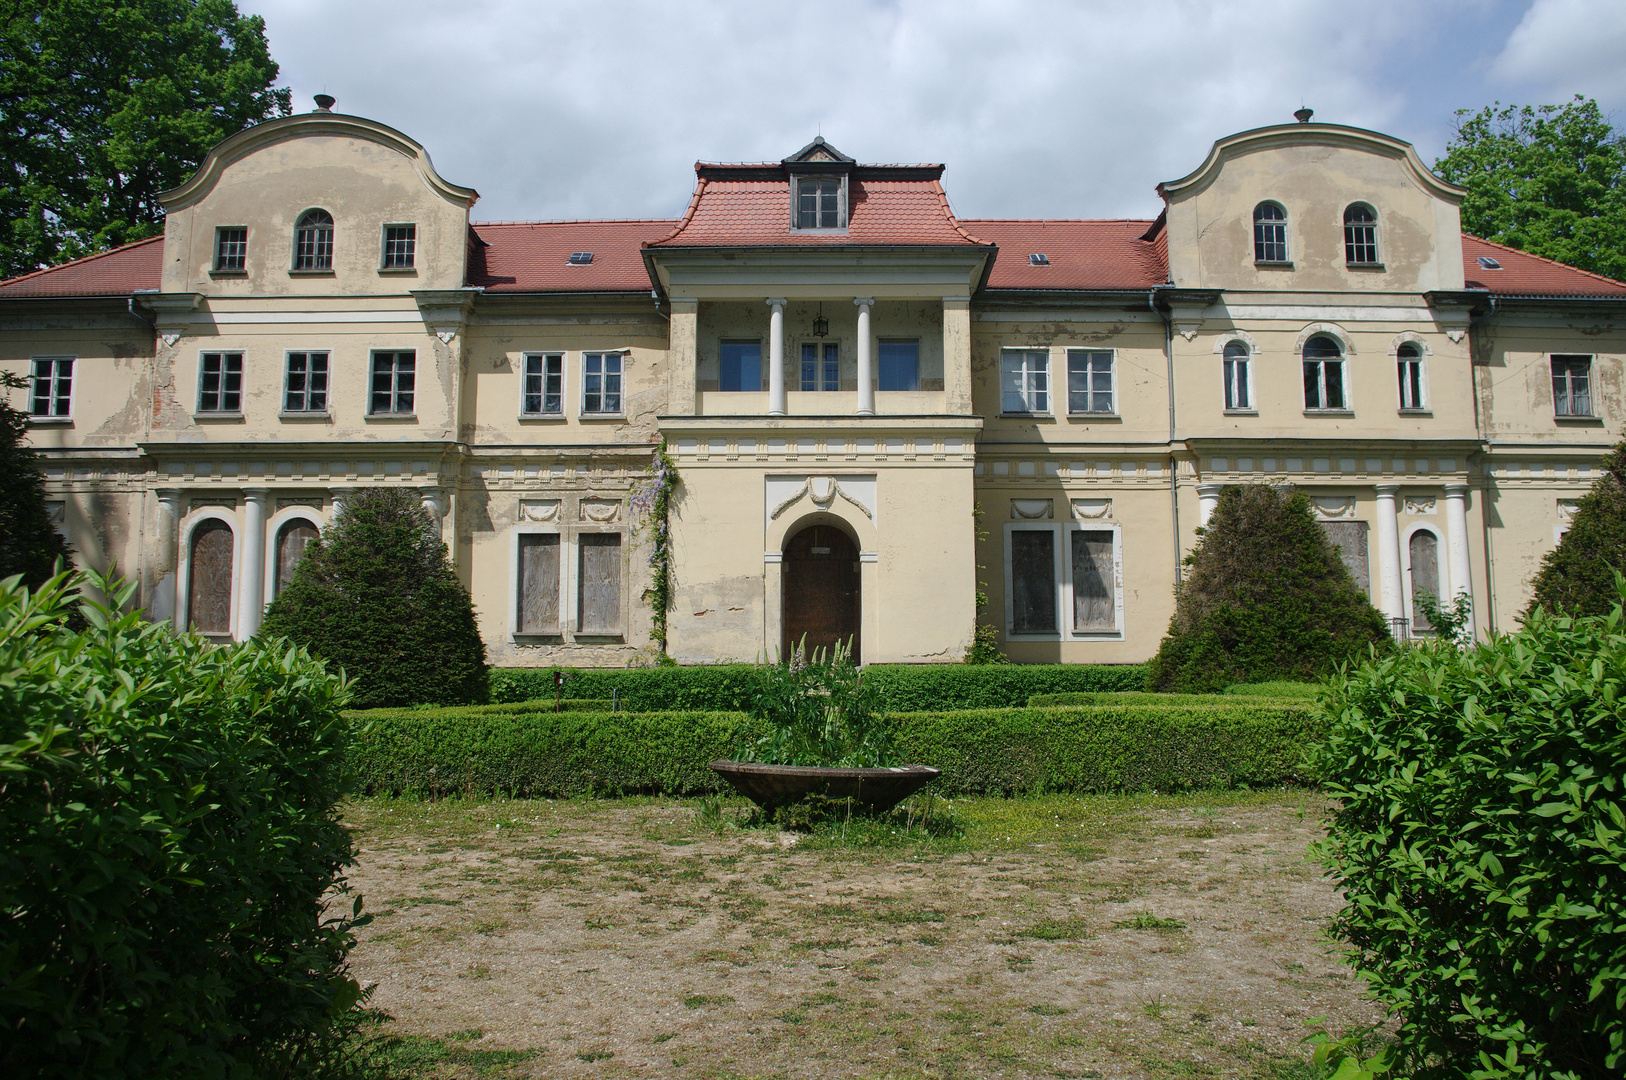 Schloß Tannenfeld